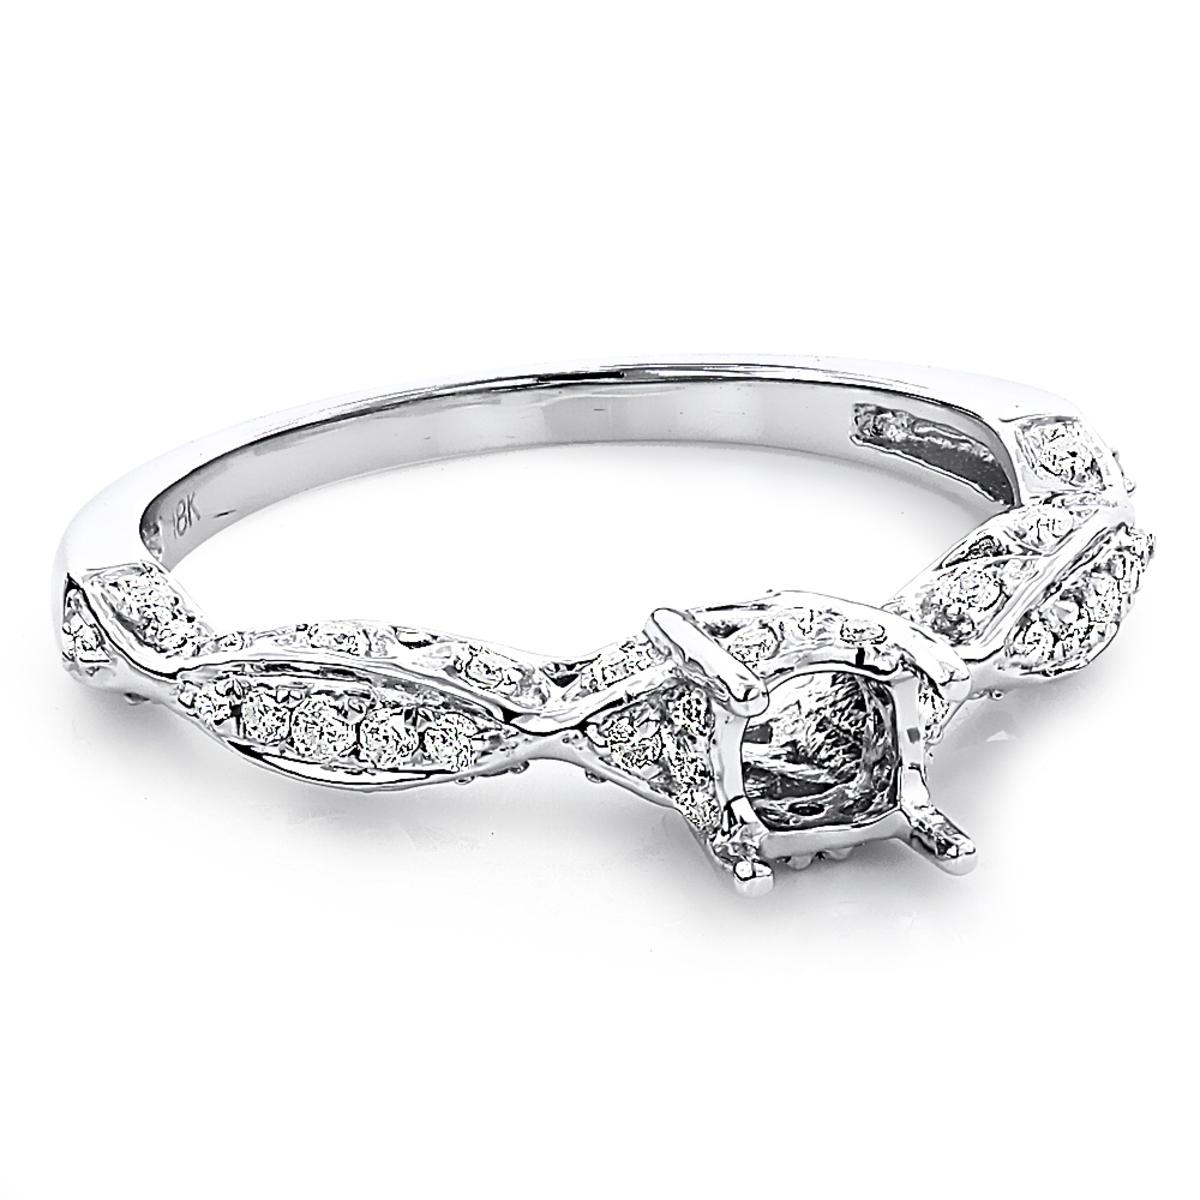 18K Gold Diamond Engagement Ring Setting 0.35ct Tacori Style